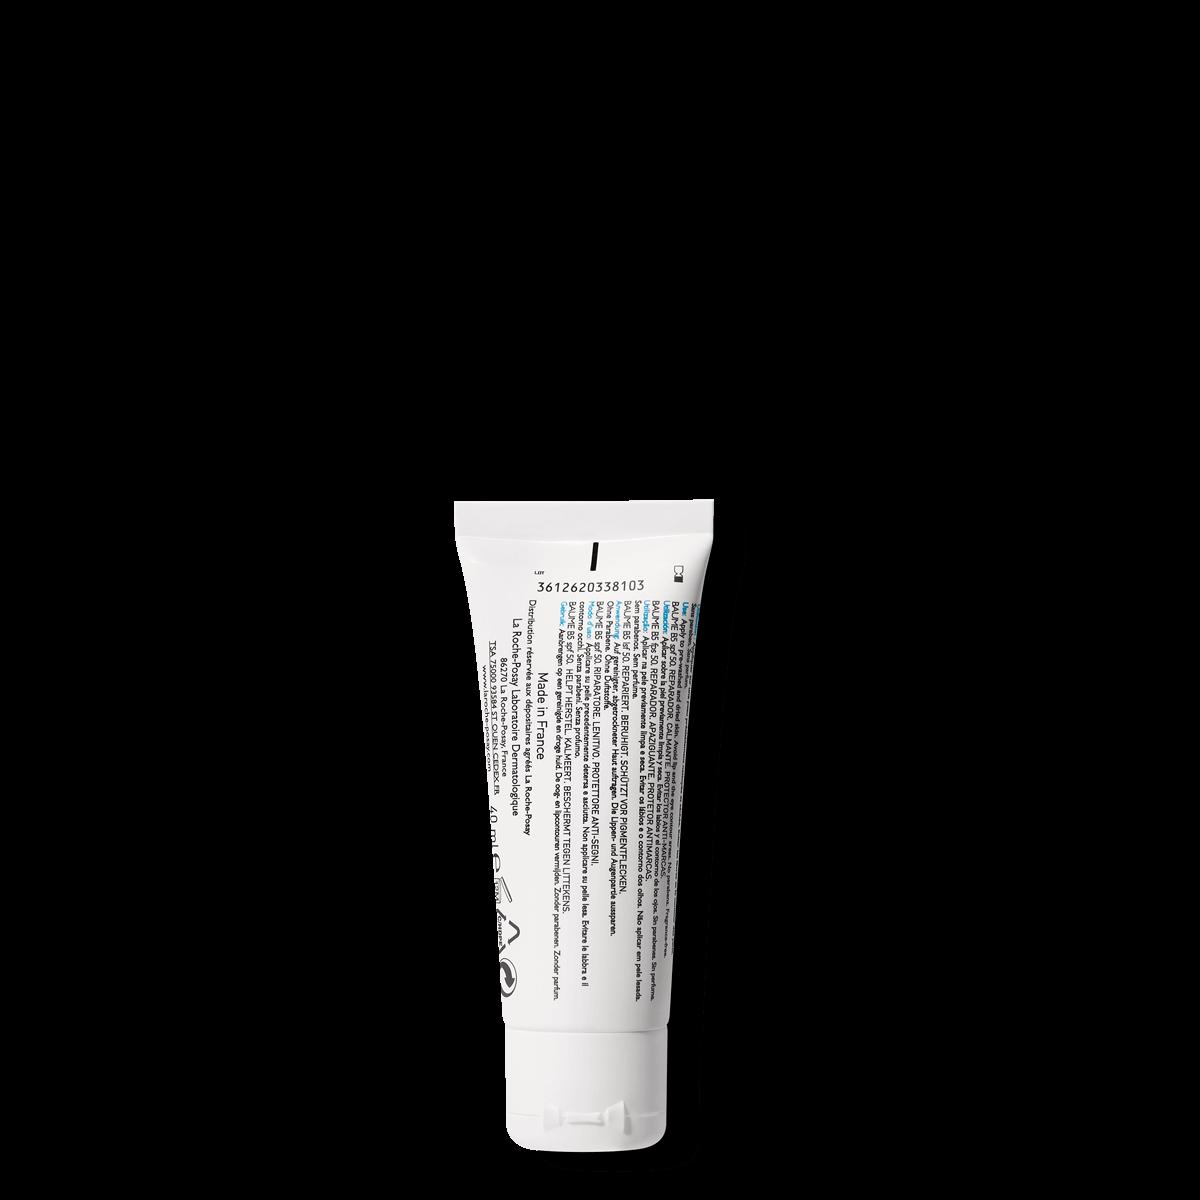 La Roche Posay ProductPage Damaged Cicaplast Baume B5 Spf50 40ml 33378